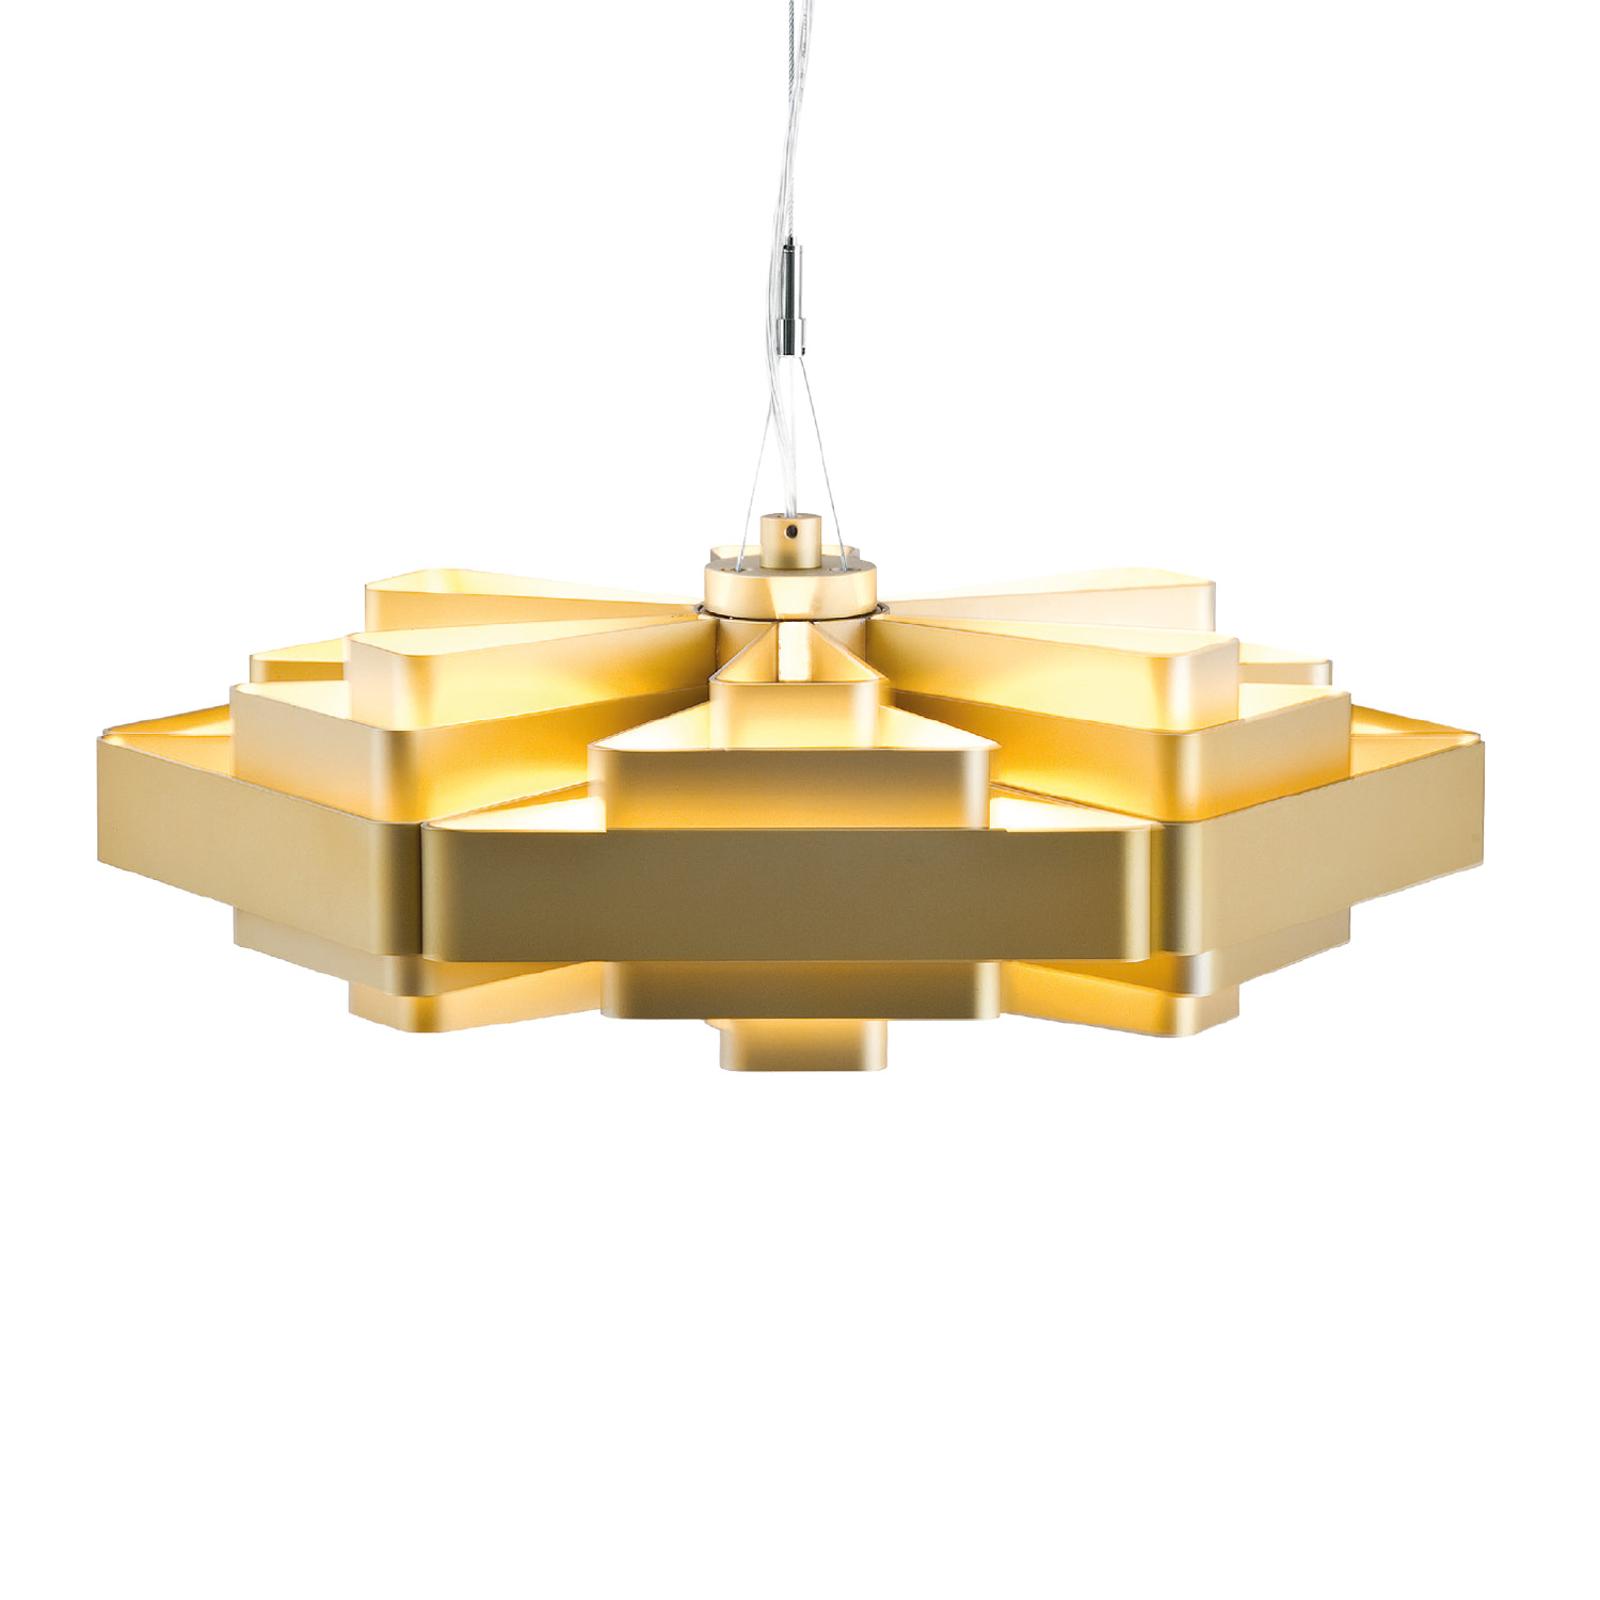 WEVER & DUCRÉ J.J.W. 04 hanglamp goud